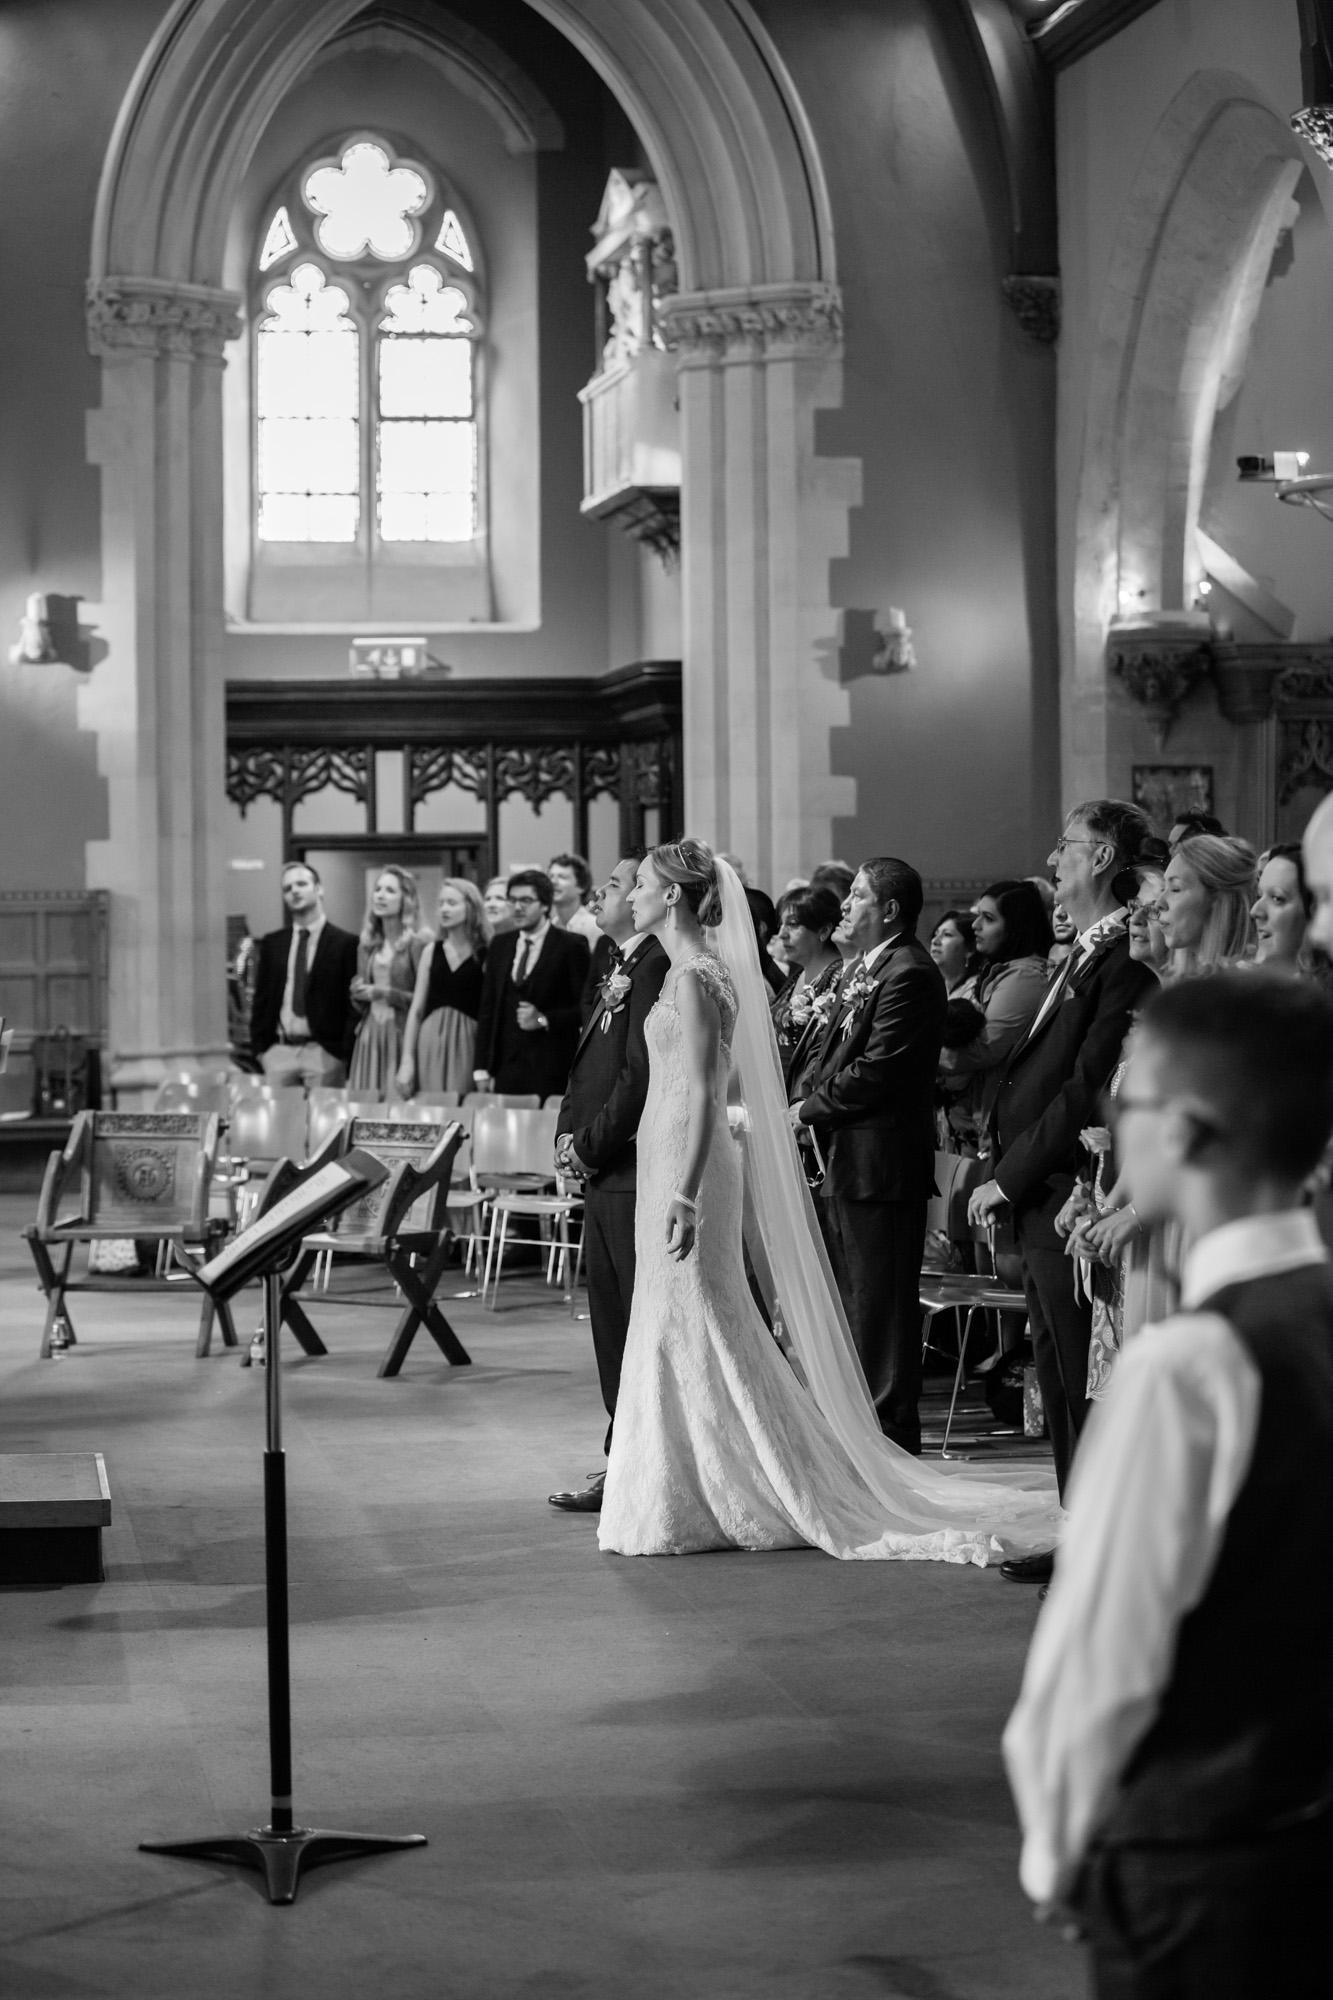 weddings-couples-love-photographer-oxford-london-jonathan-self-photography-36.jpg